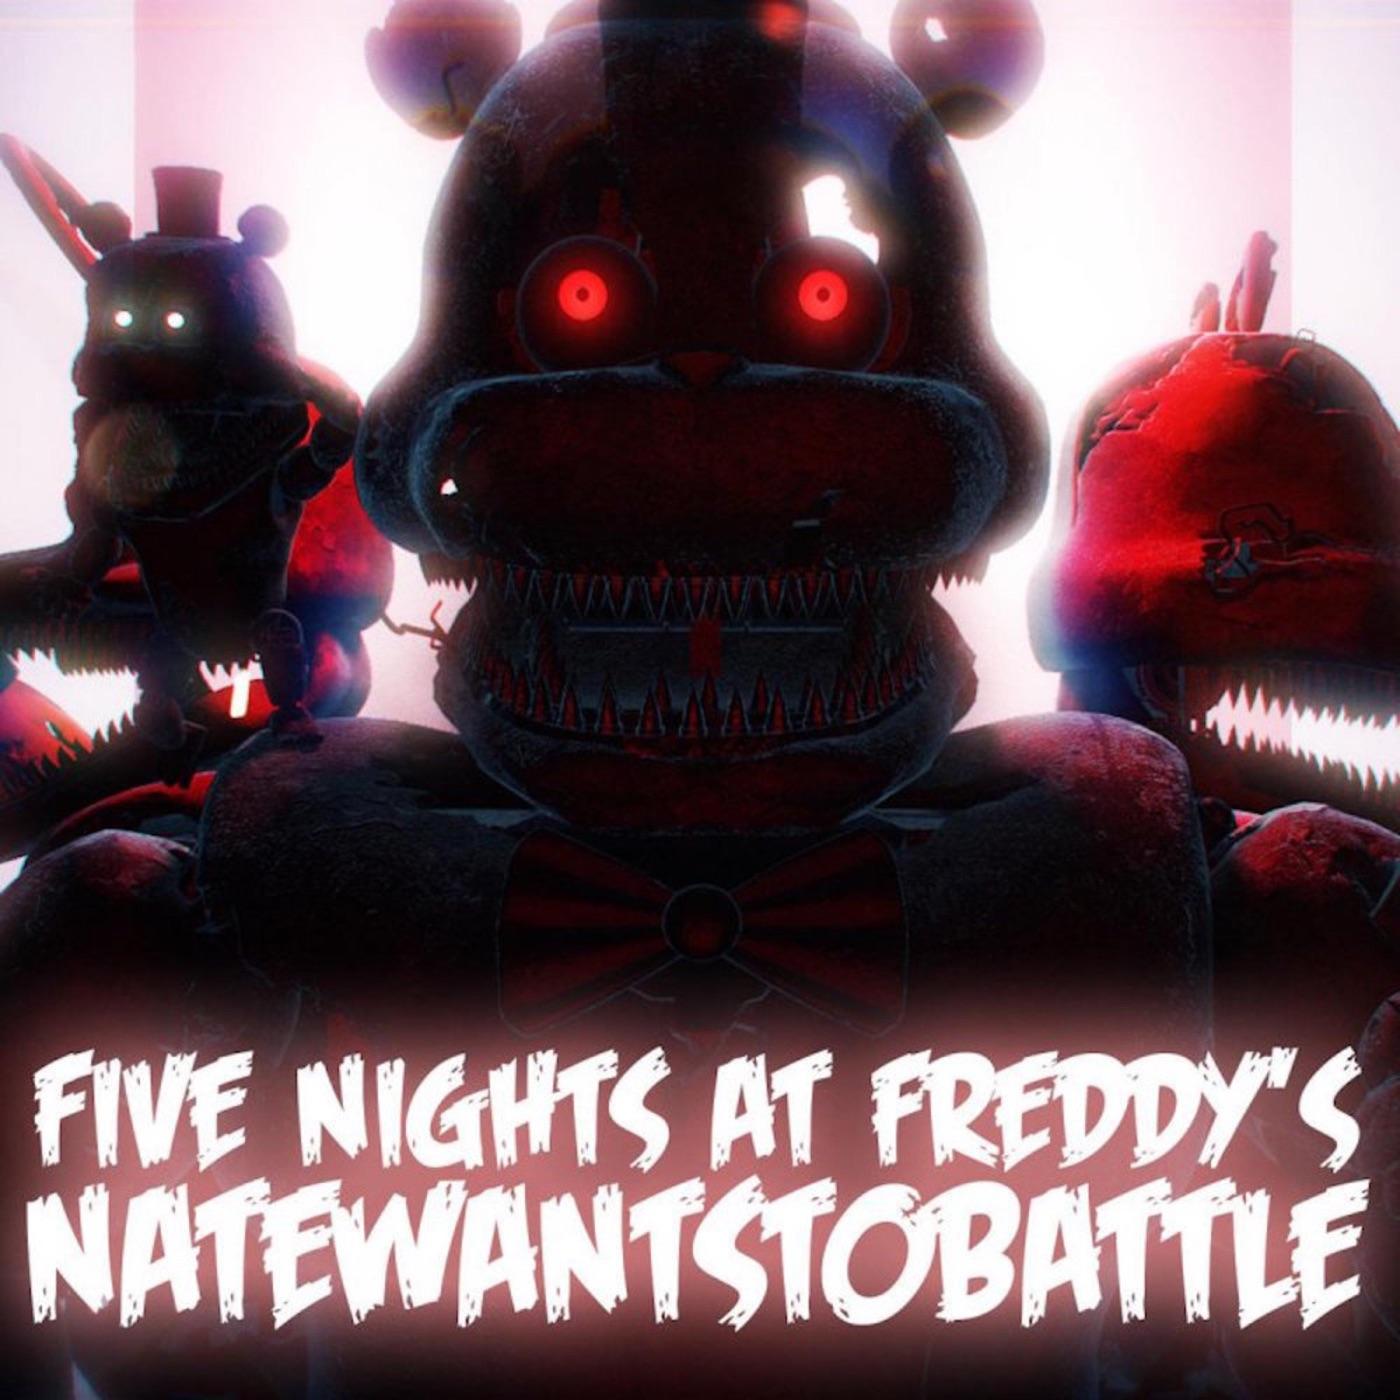 NateWantsToBattle - Five Nights at Freddy's (2015)